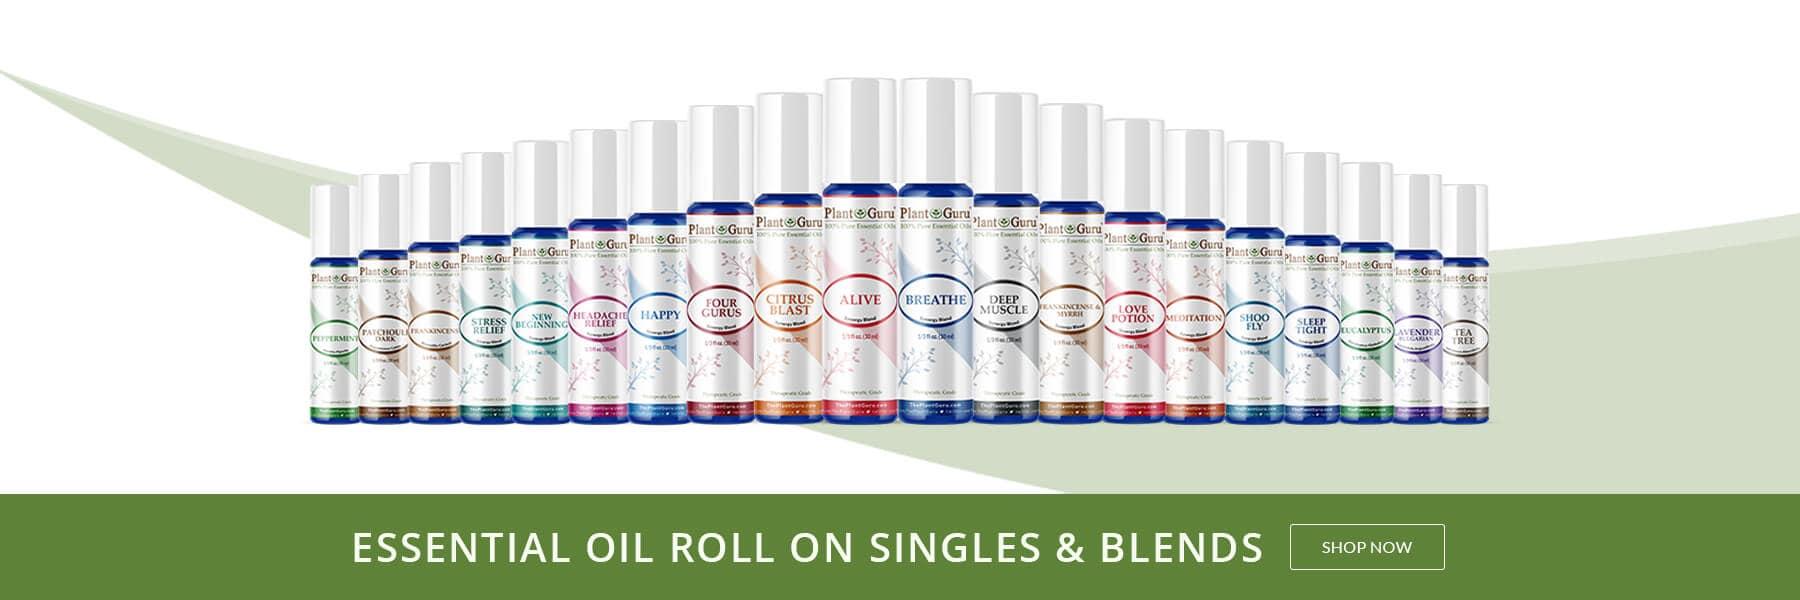 Esseential Oil Roll